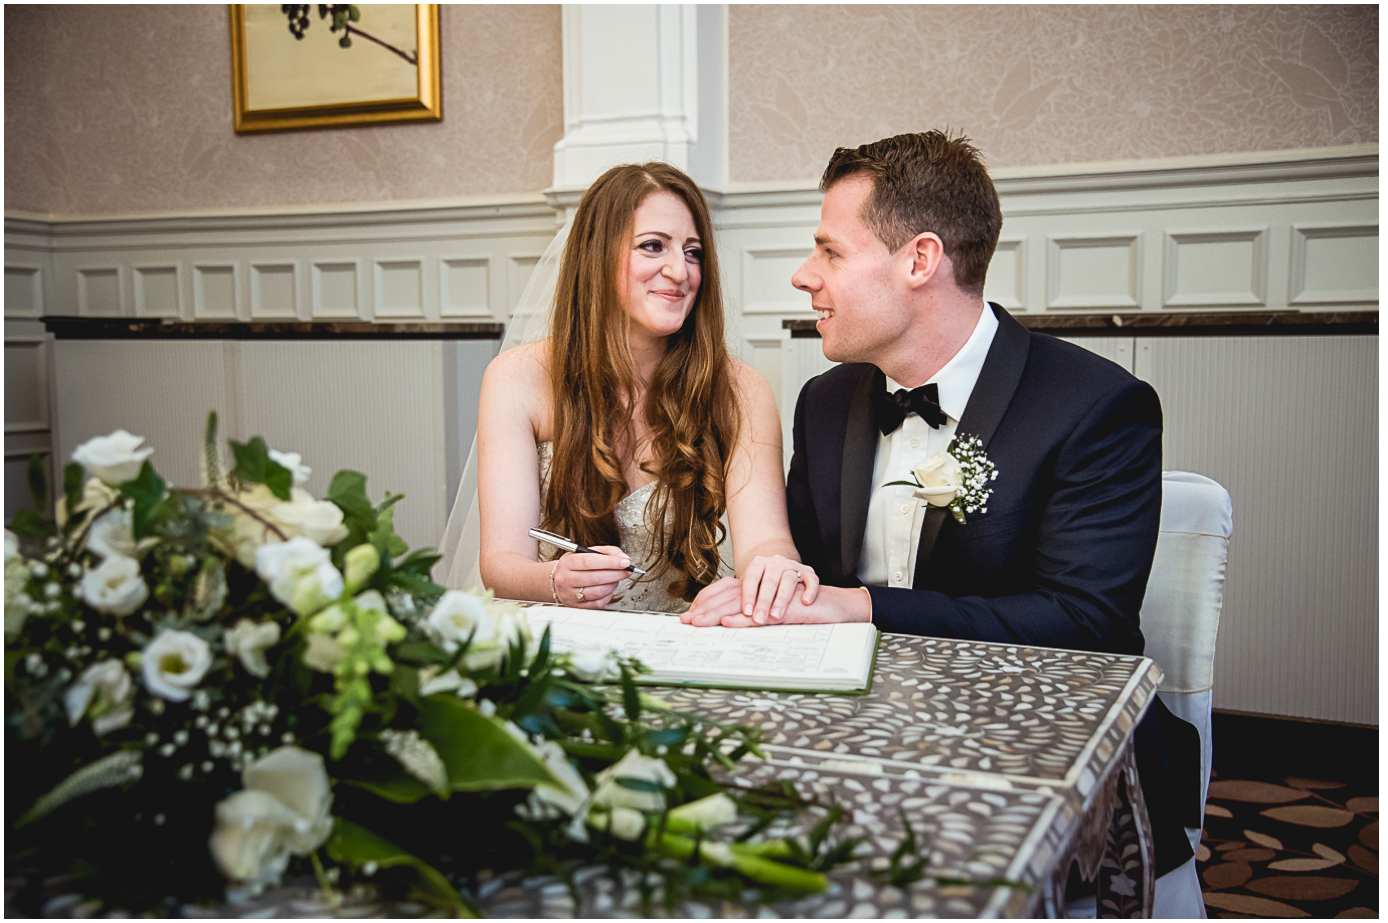 38 - Esmat and Angus - St. Ermin's Hotel London wedding photographer